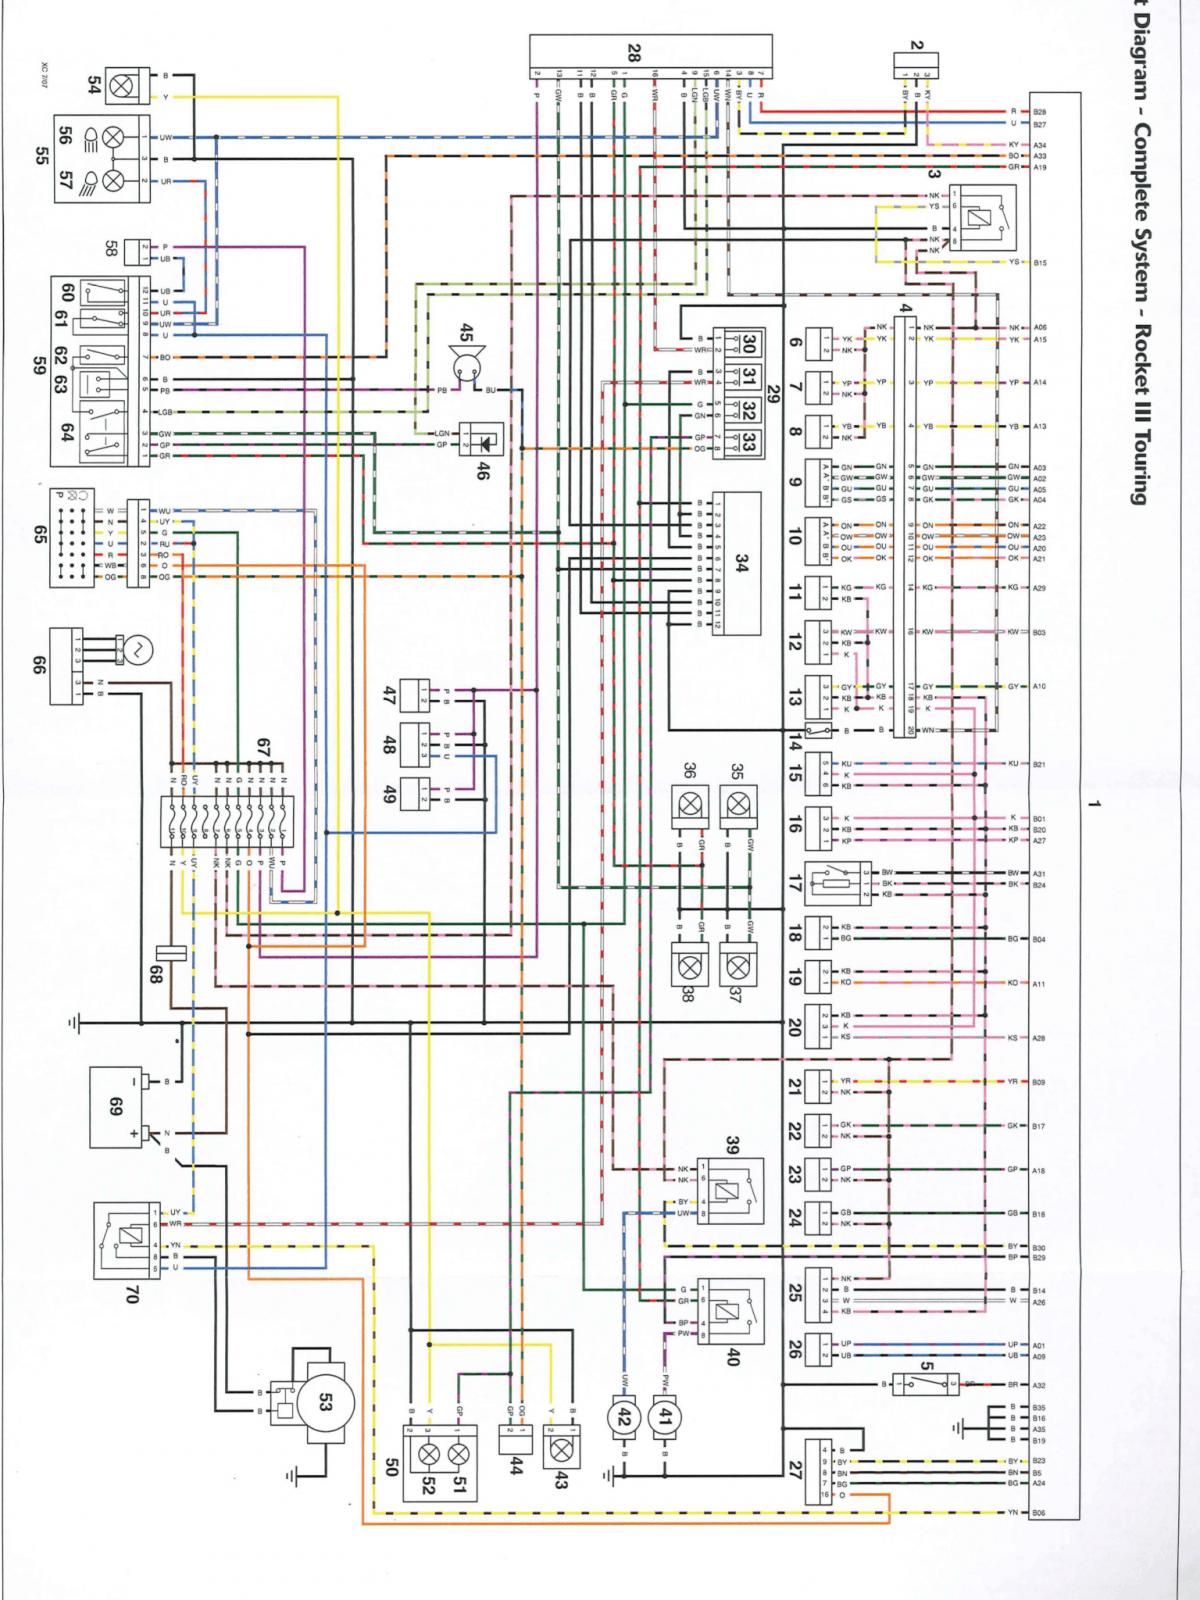 SE_7405] Thruxton Triumph Forum Triumph Rat On Wiring Diagram 2010 Triumph